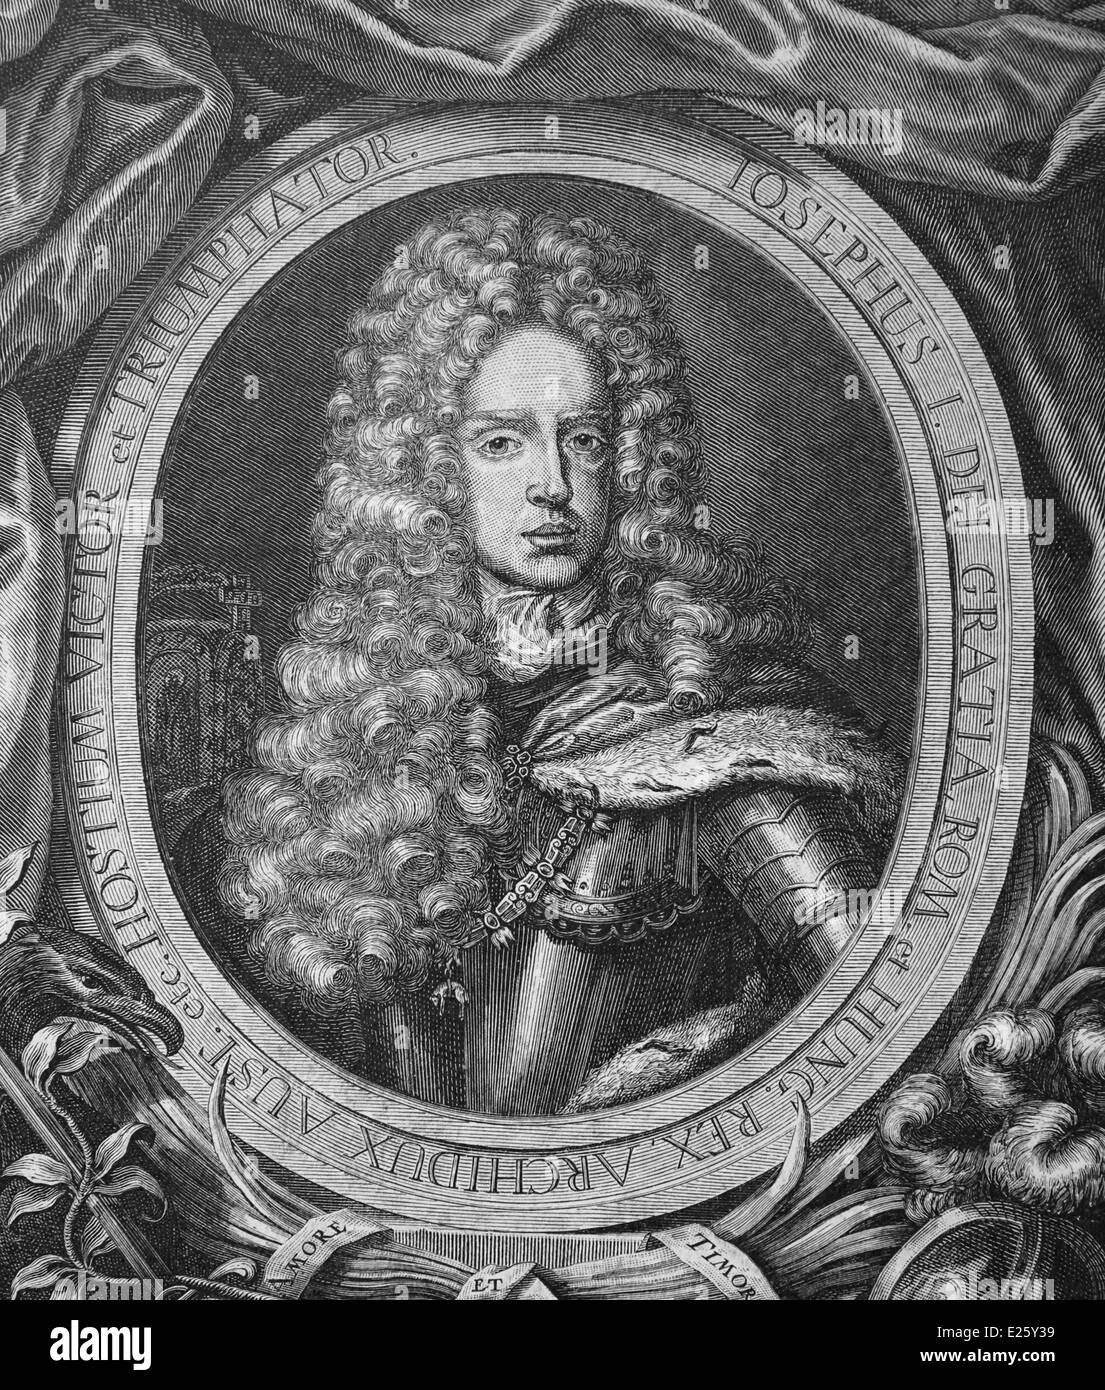 Joseph I (1678-1711). Holy Roman Emperor from 1705-1711. Engraving, 19th century. - Stock Image